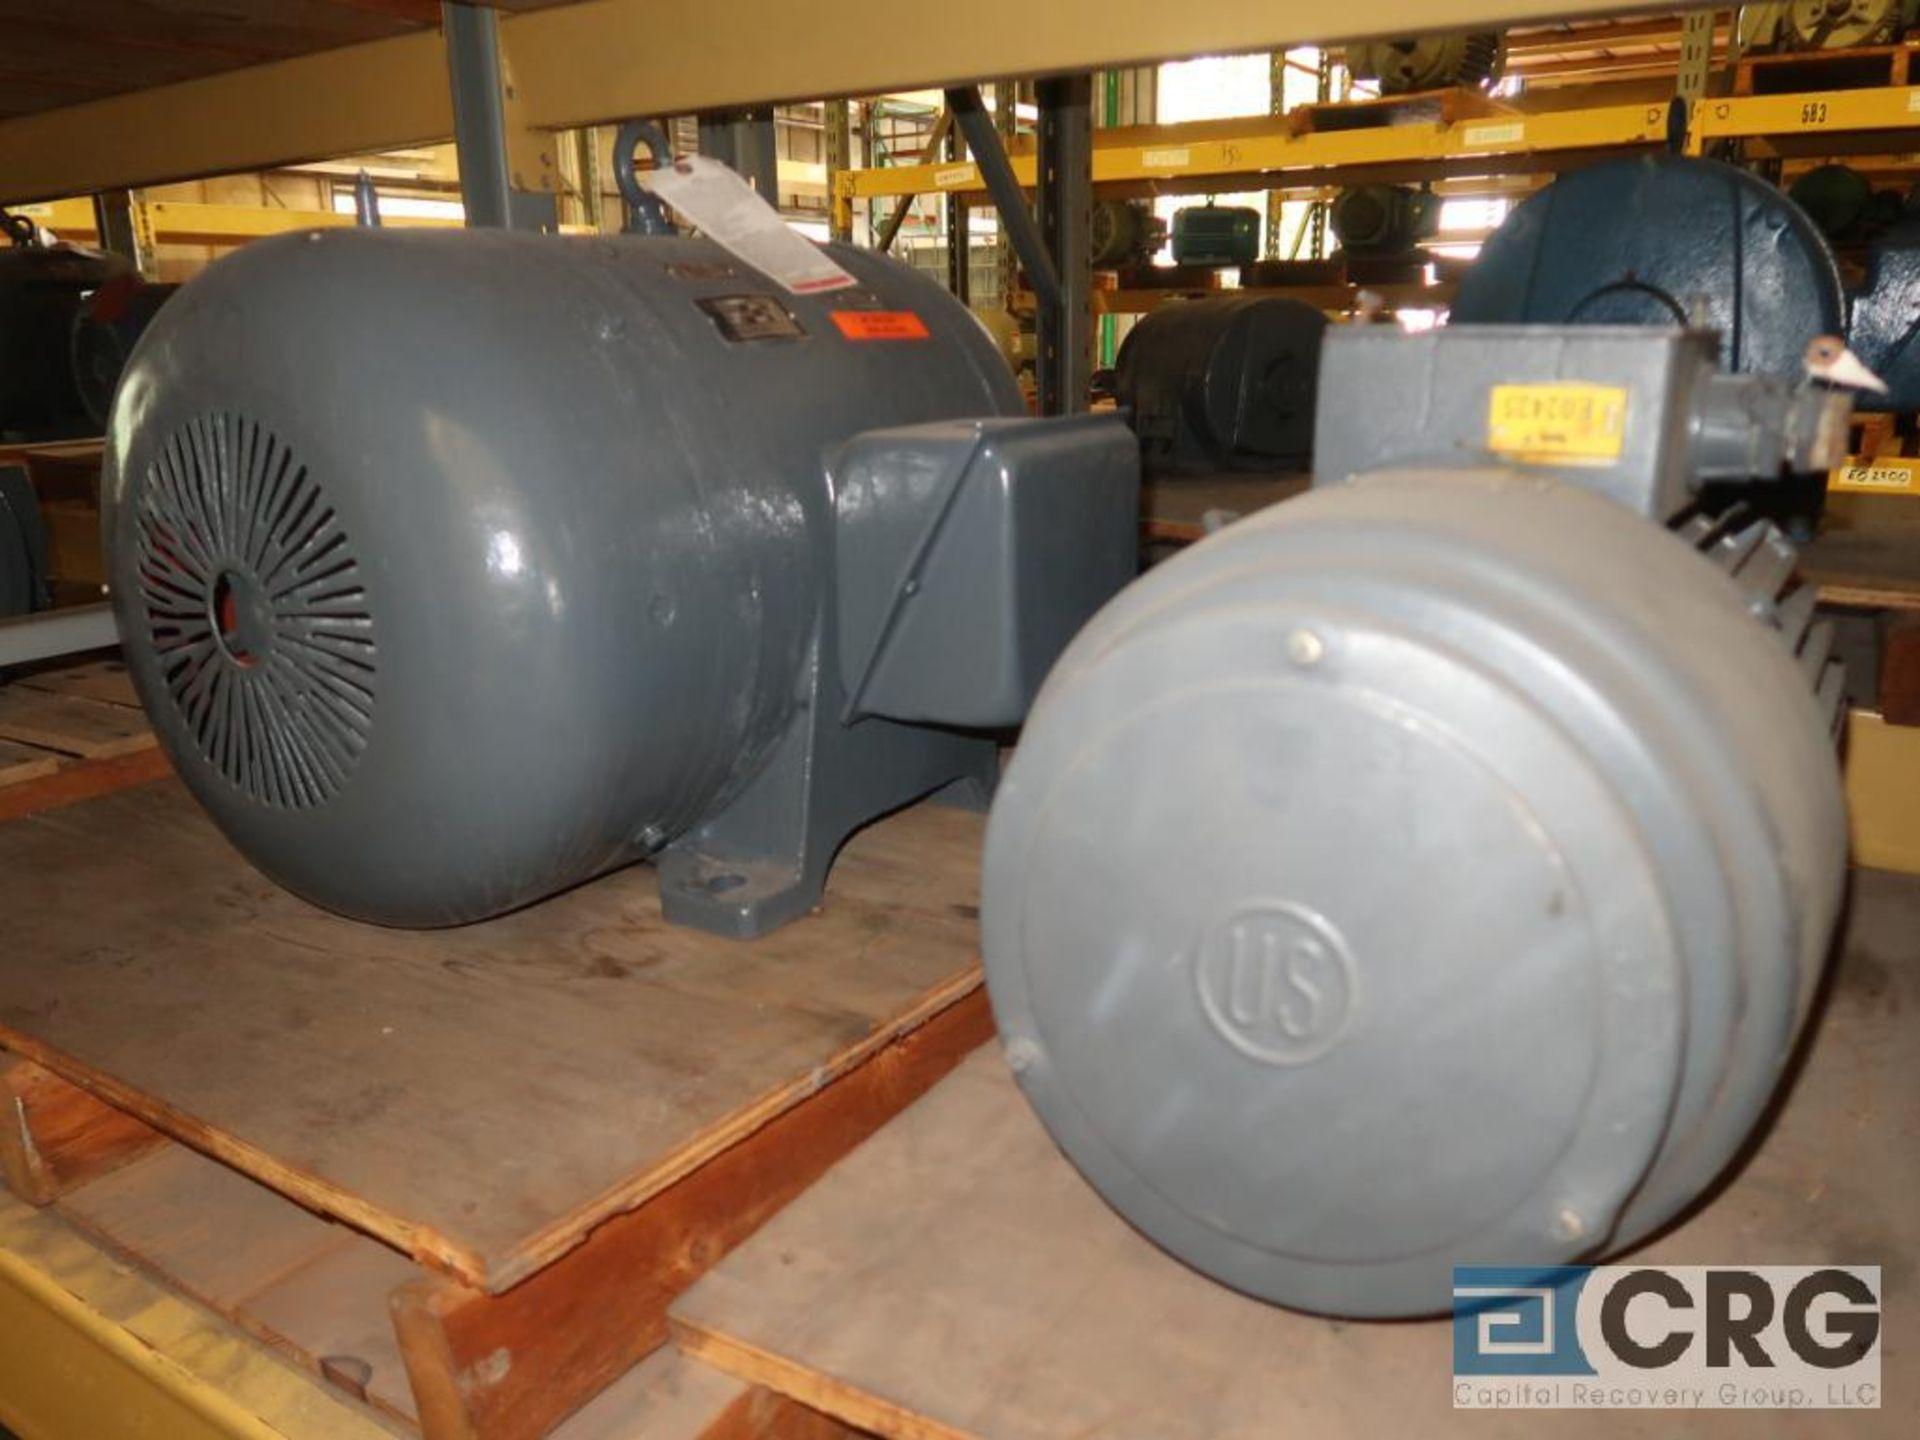 Lot of (4) assorted 20 HP motors (Motor Building) - Image 2 of 2